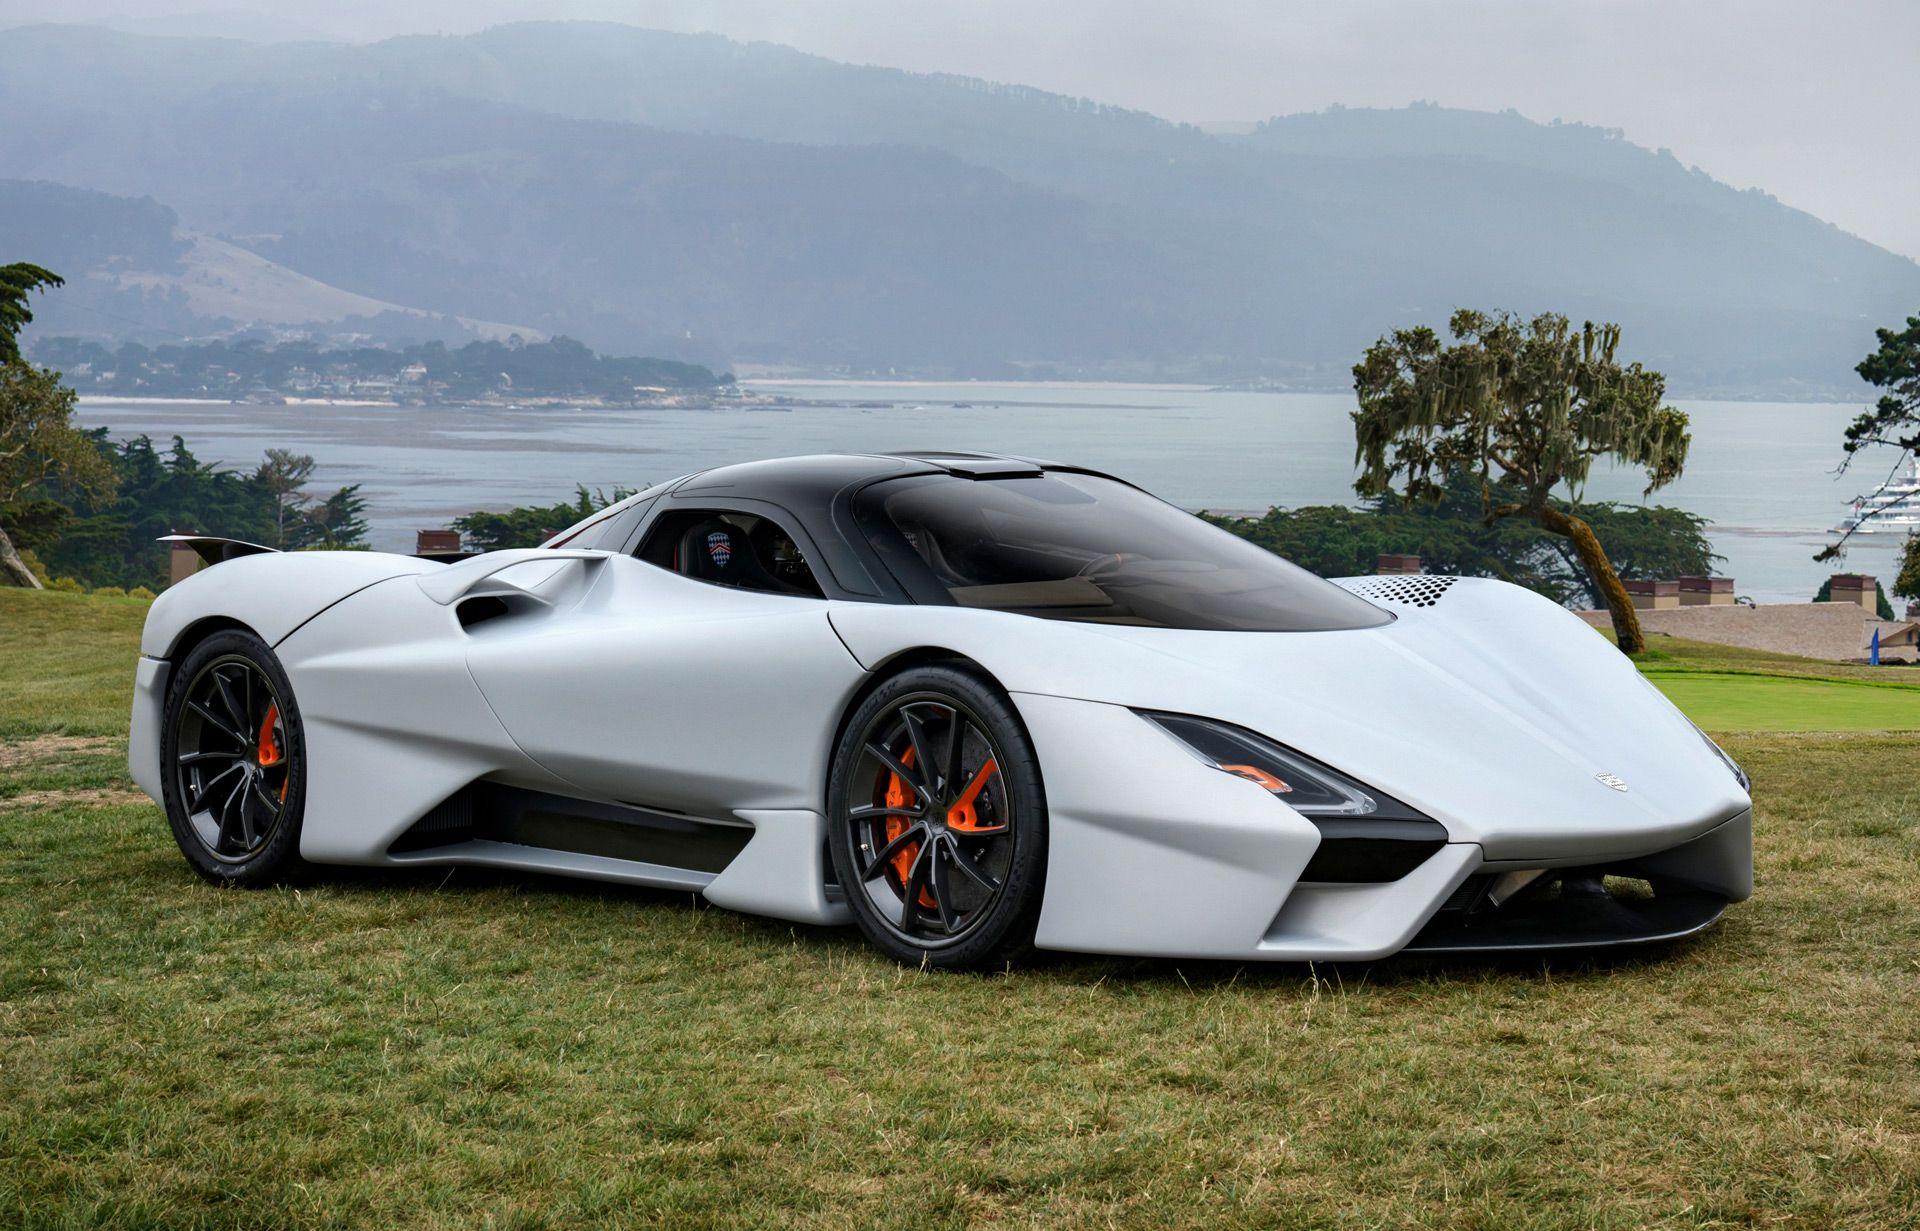 Pin By Landon Brady On Cars Cool Sports Cars Sports Cars Luxury Tuatara